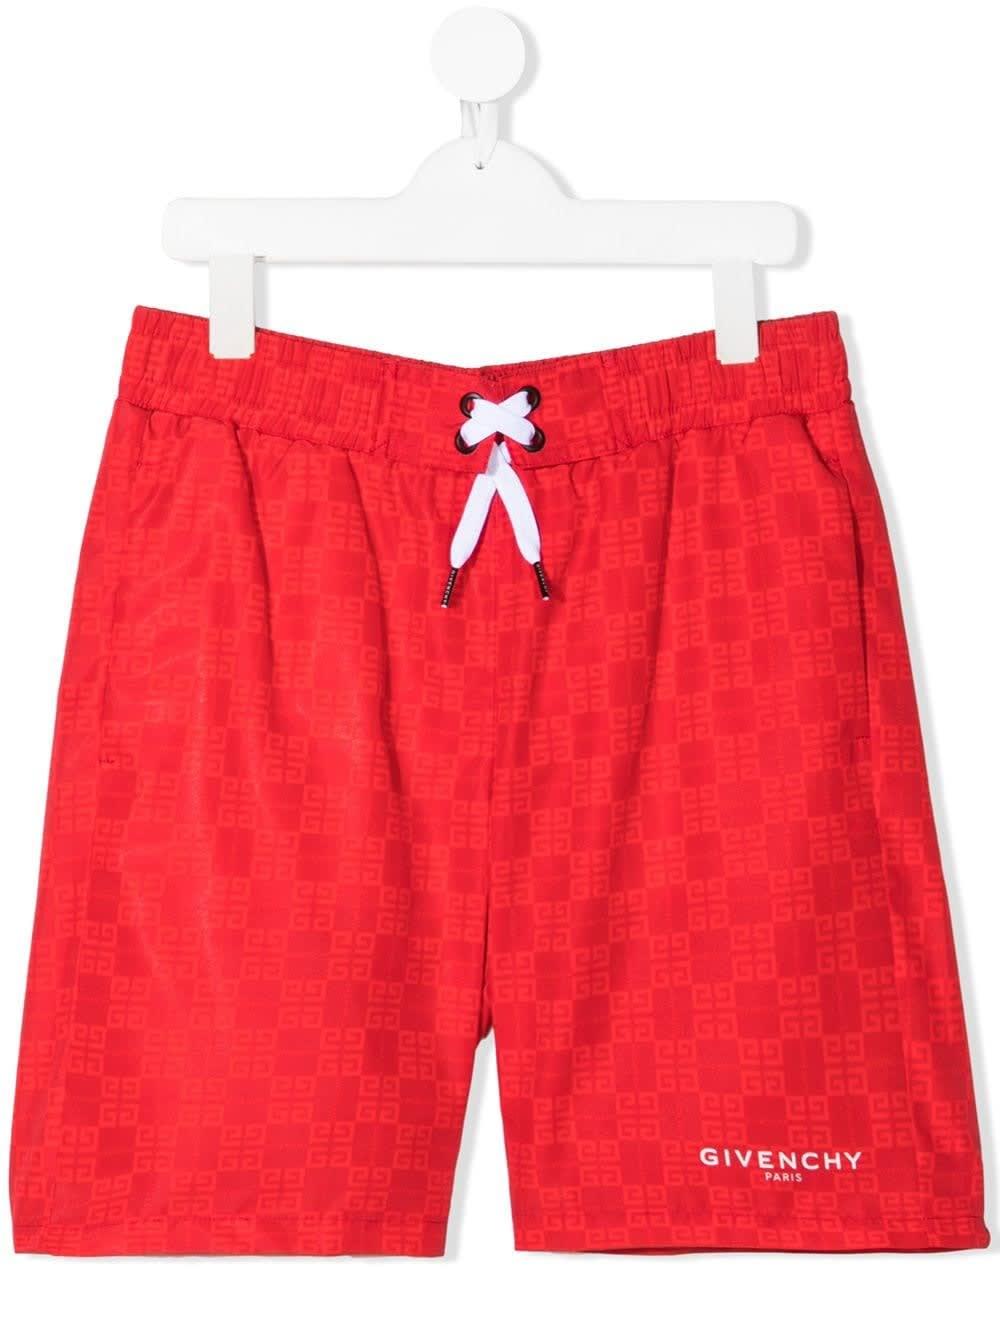 Givenchy Shorts RED SWIM SHORTS WITH JACQUARD LOGO